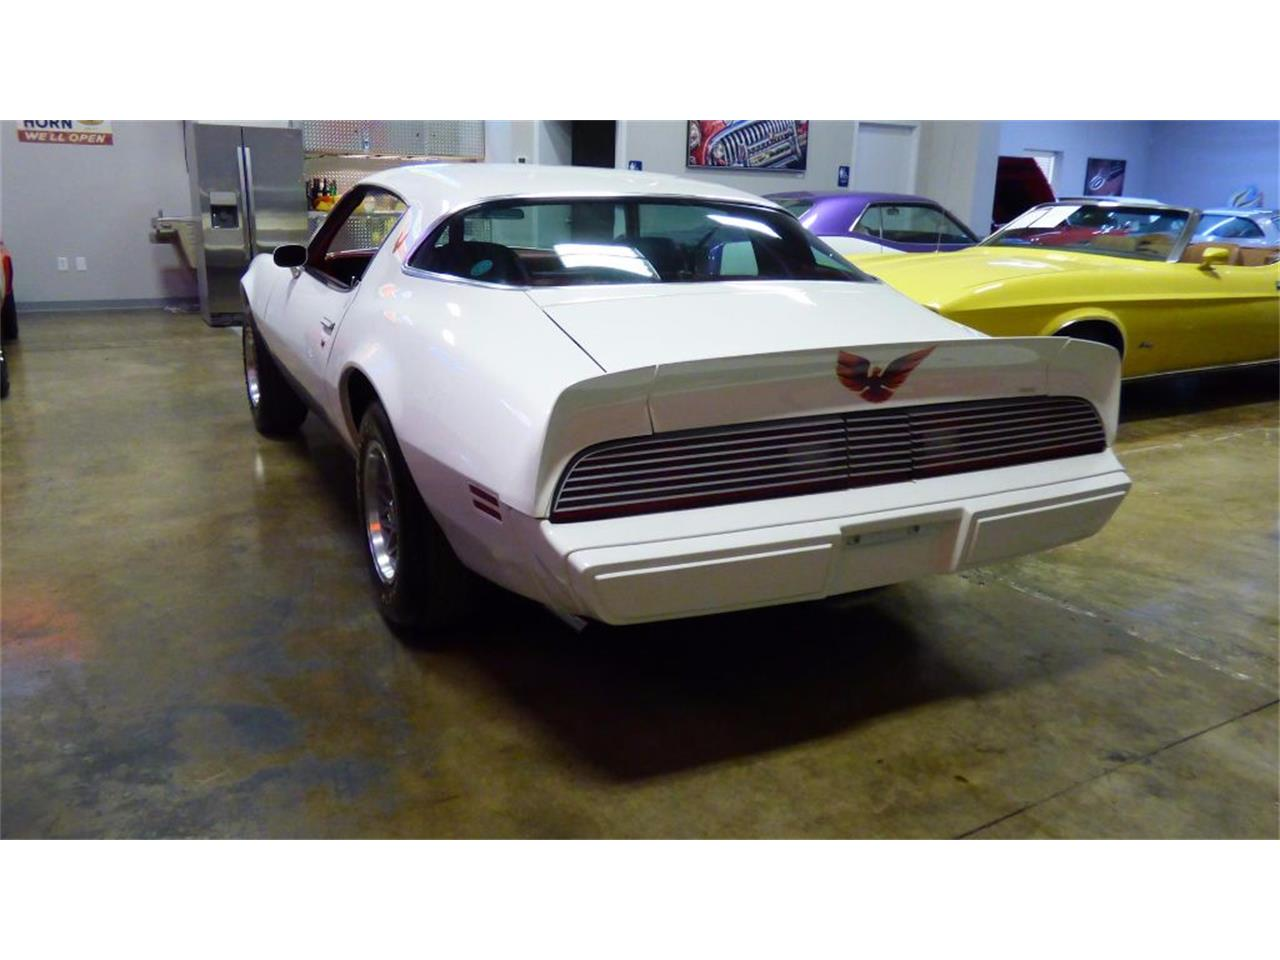 Large Picture of '79 Pontiac Firebird located in Atlanta Georgia - $14,995.00 - F2EV